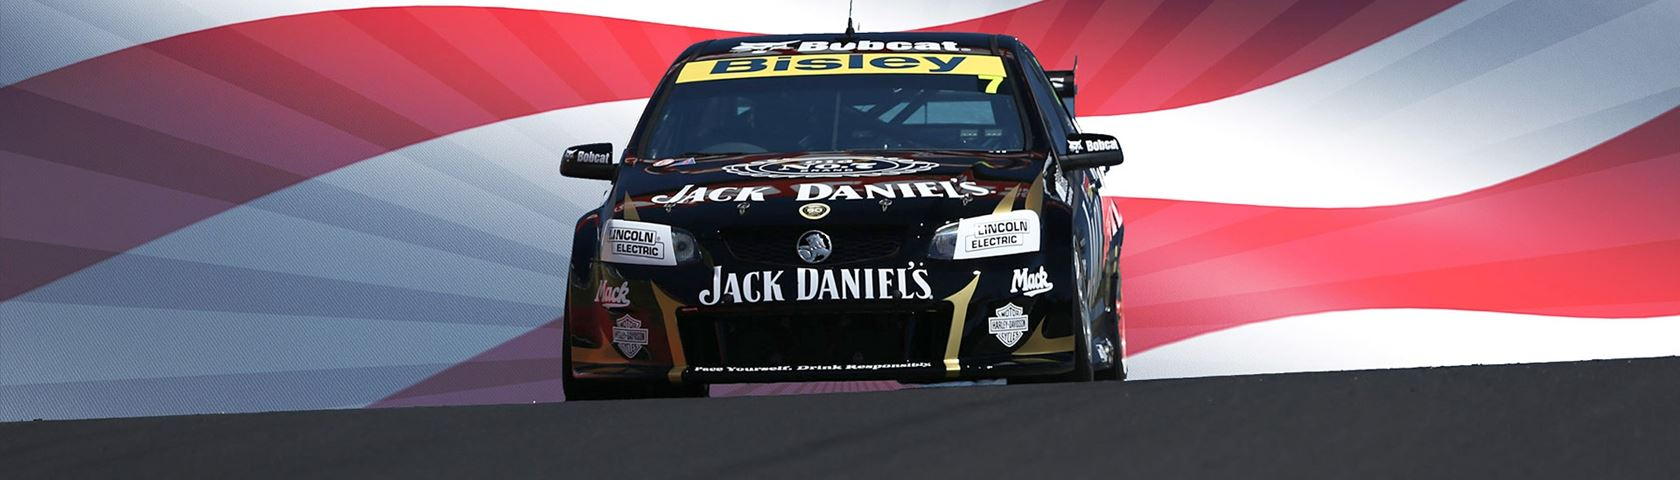 Jack Daniel's V8 Supercar